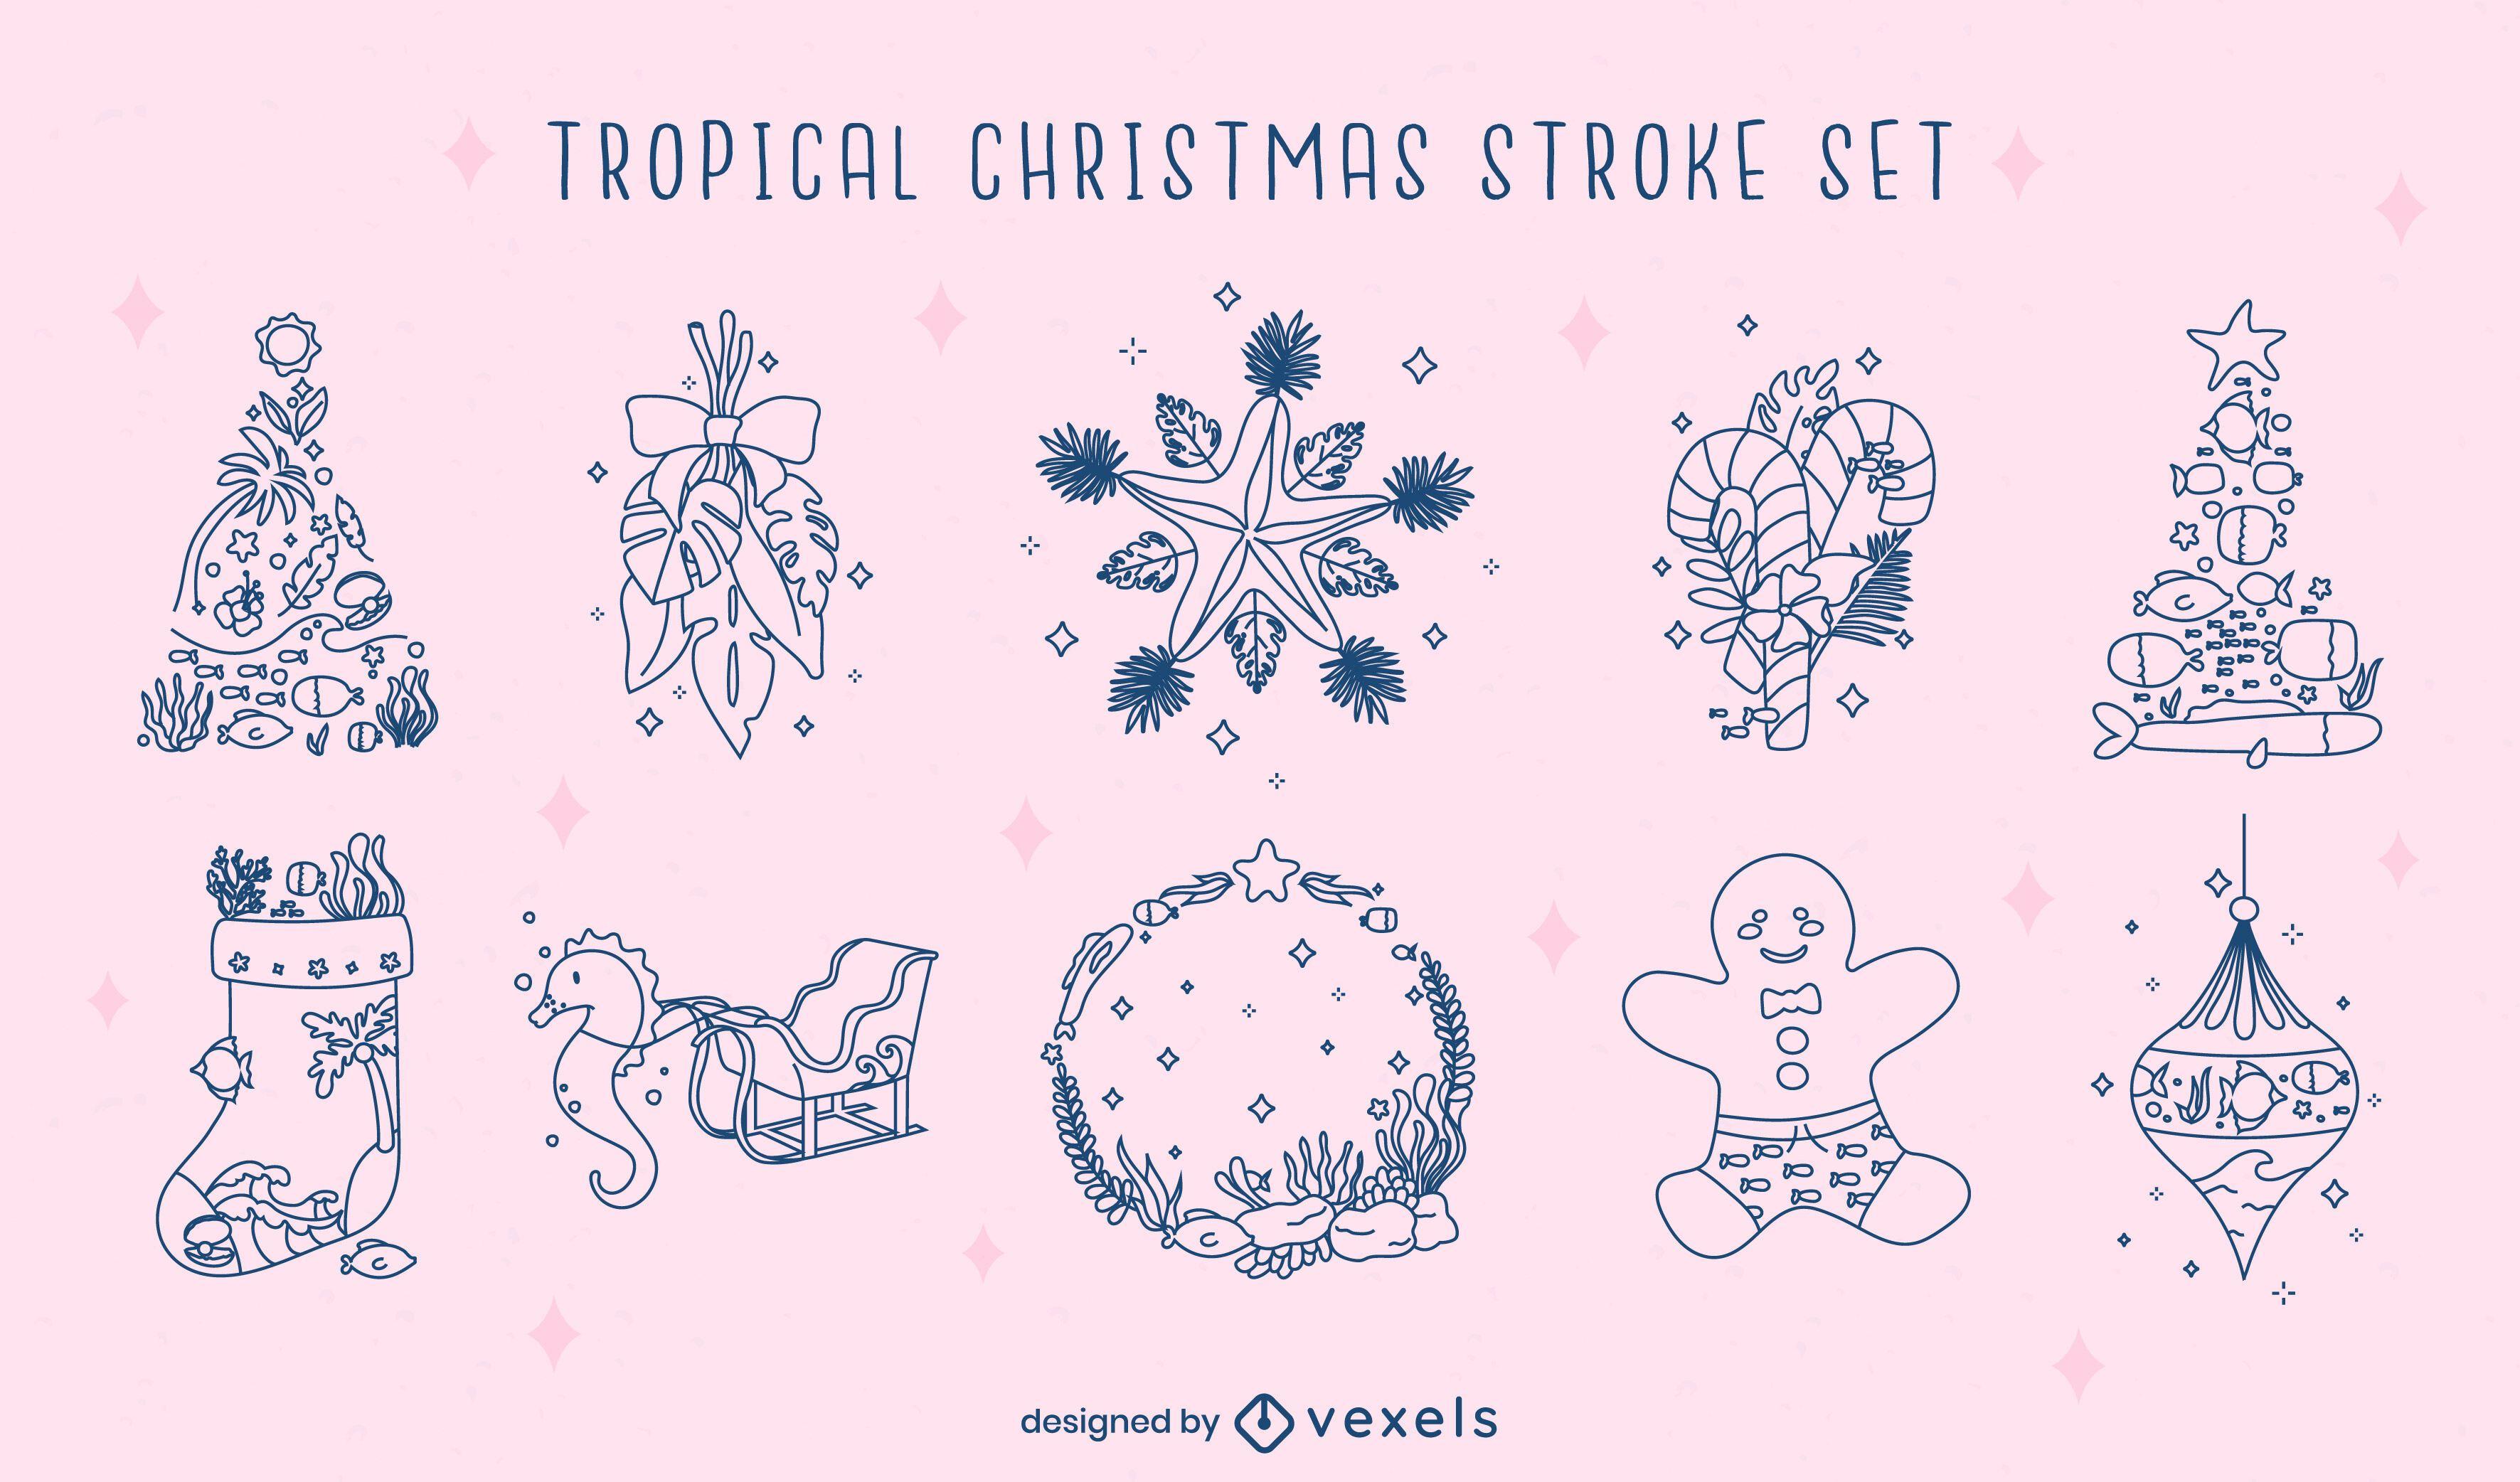 Conjunto de trazos de temporada navideña tropical